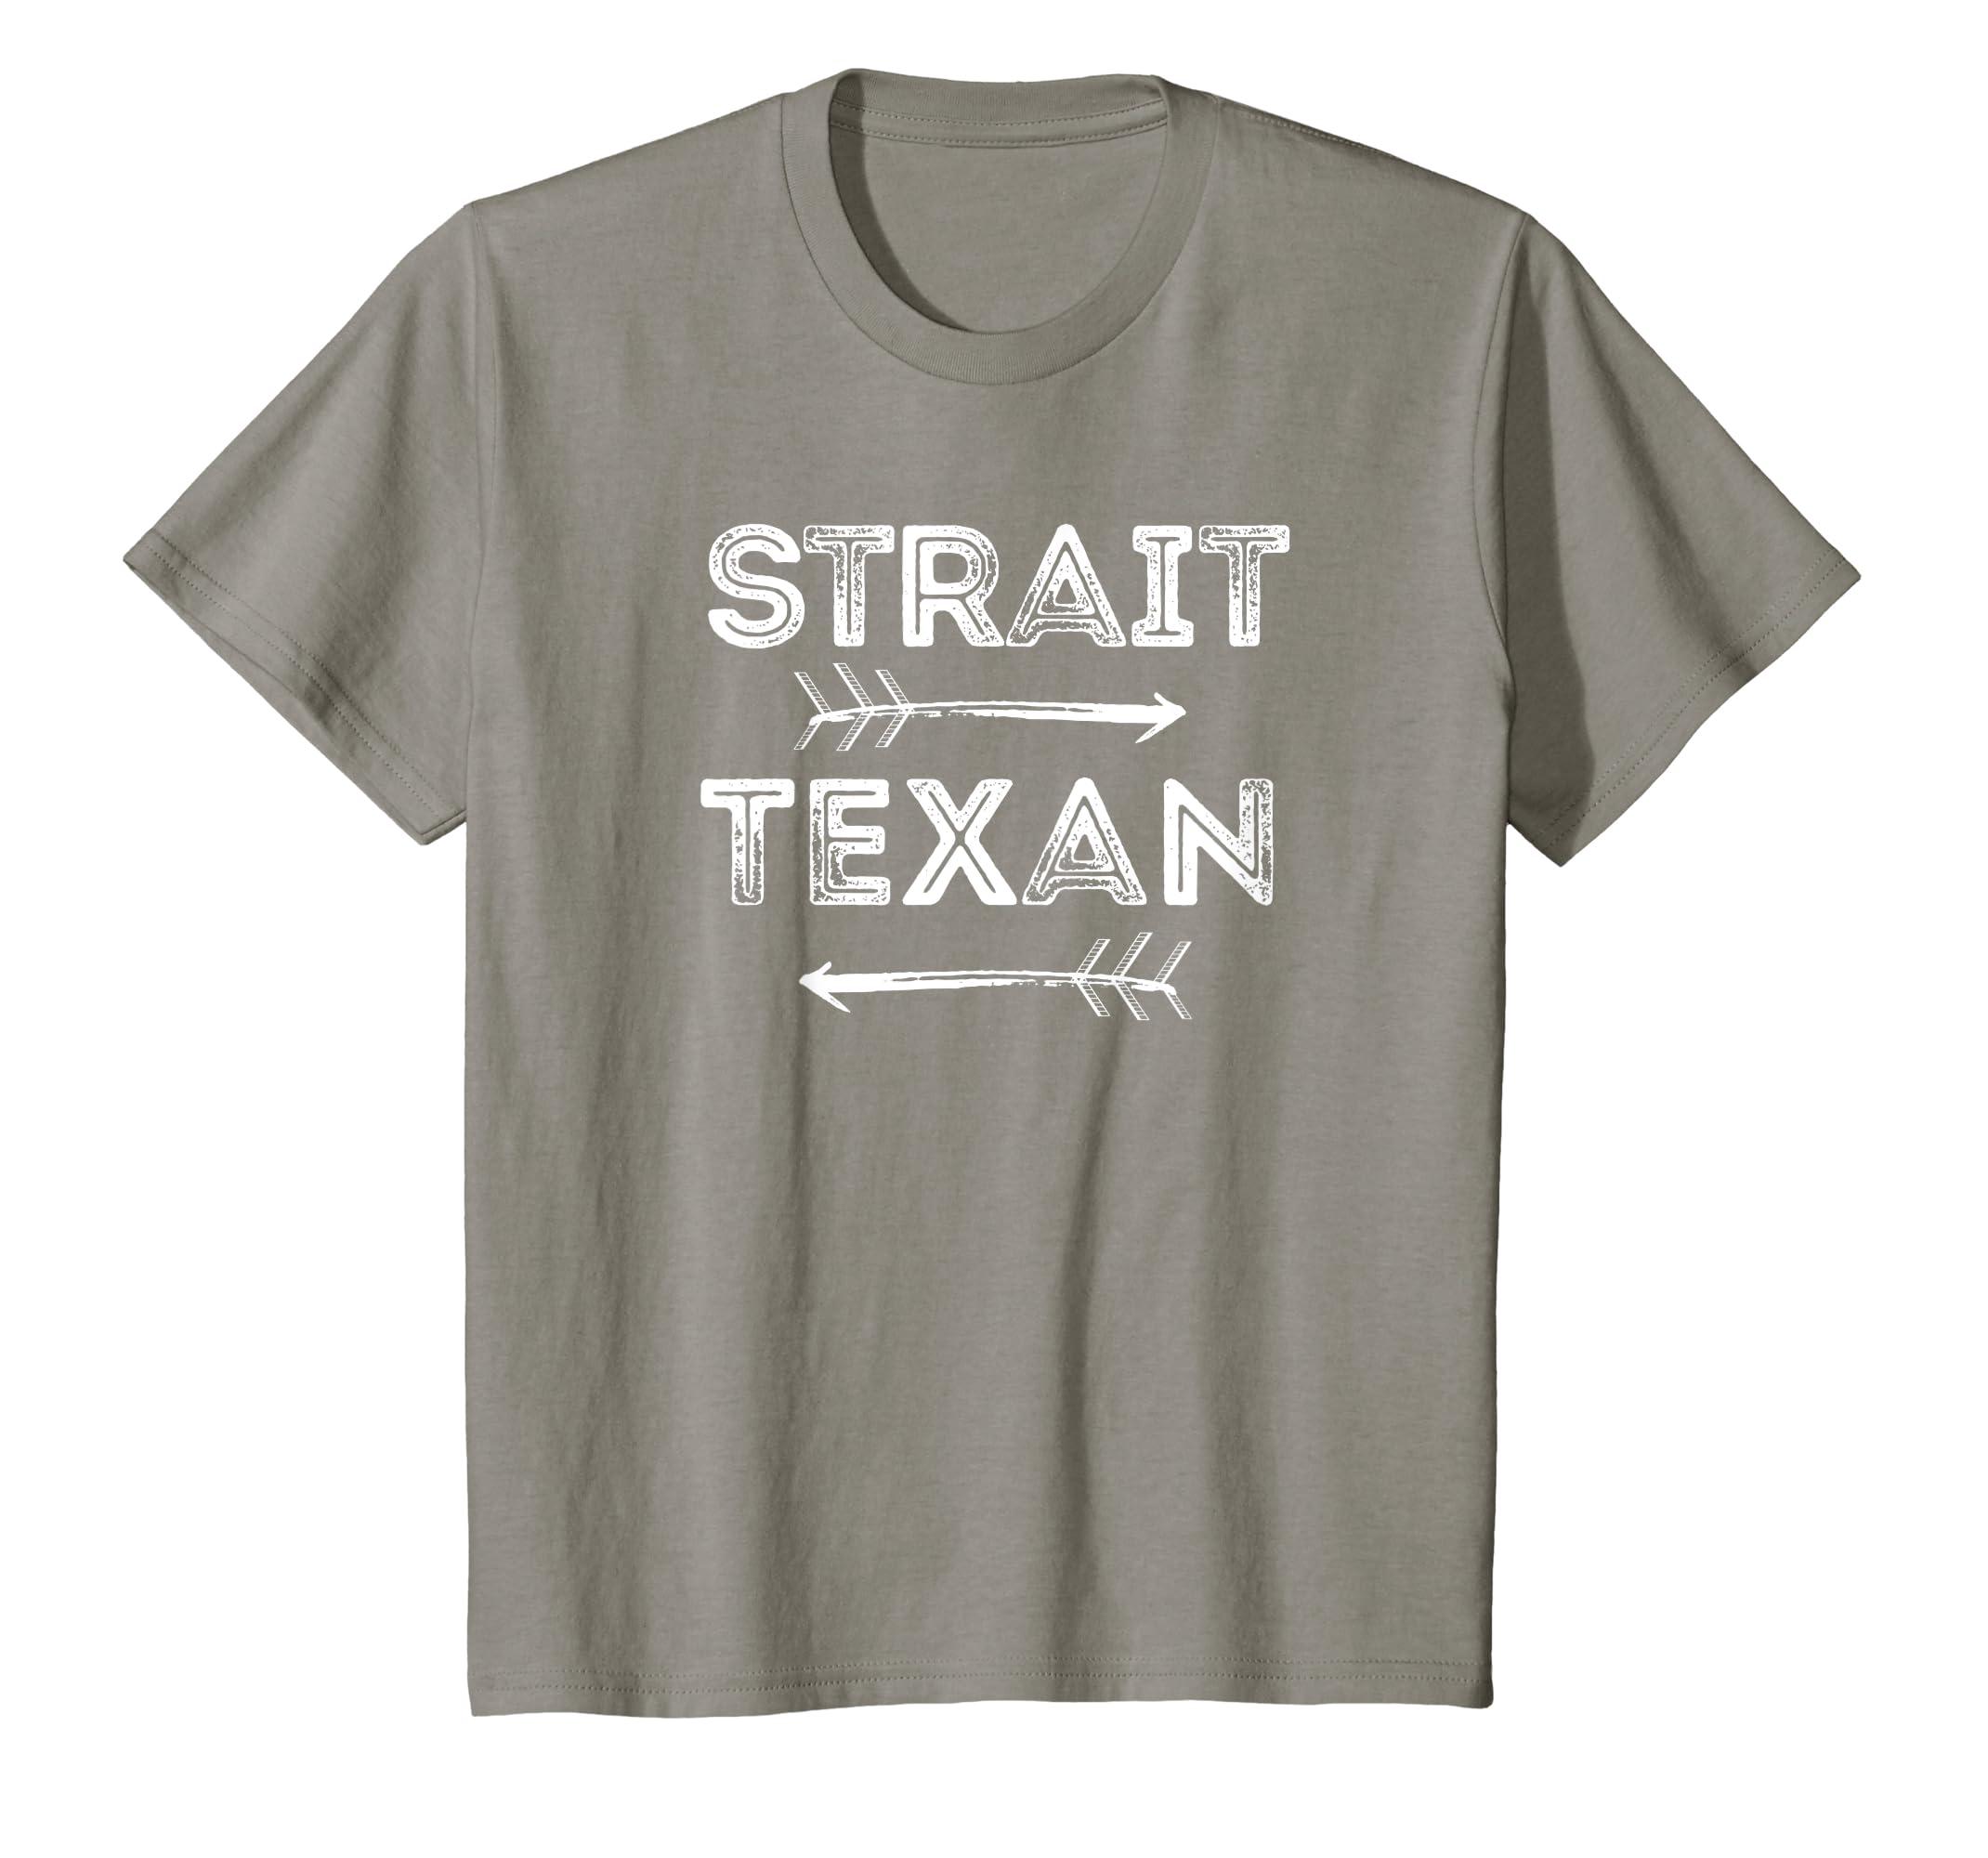 Amazon.com  Strait Texan T-Shirt Texas Pride Saying With Arrows  Clothing 545058678